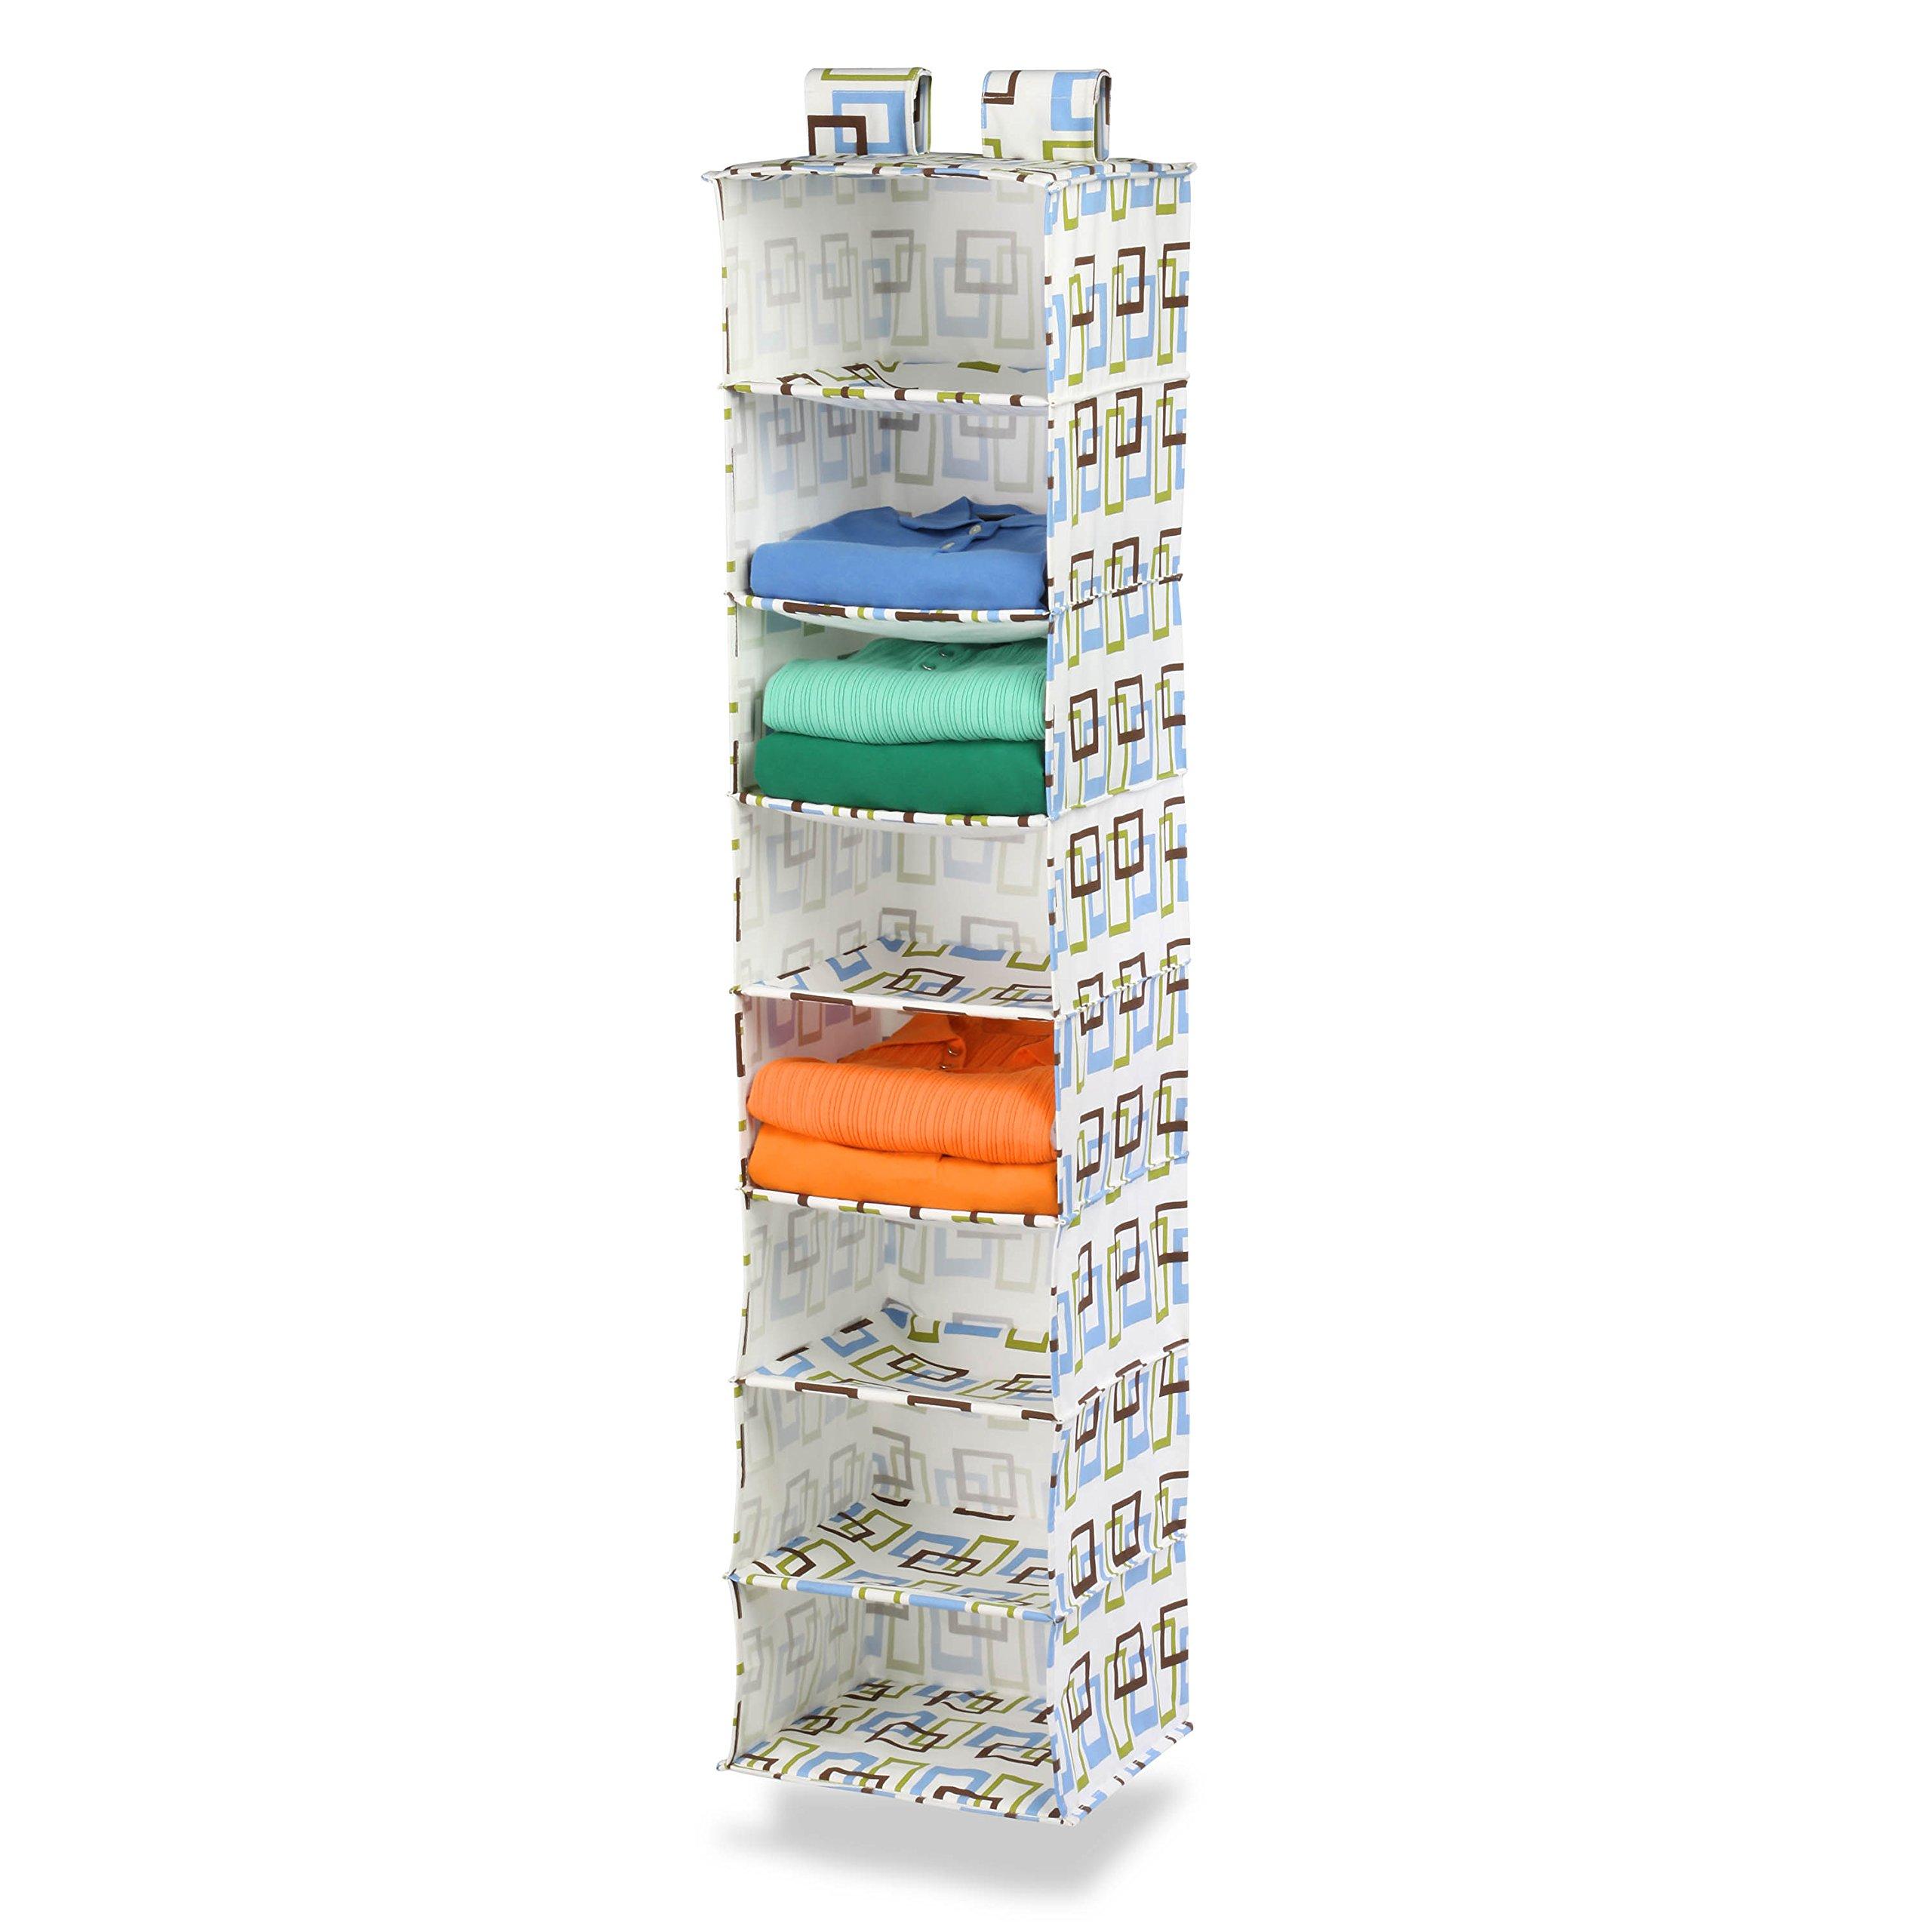 Honey-Can-Do SFT-01570 8 Shelf Hanging Organizer (Brown/Green)